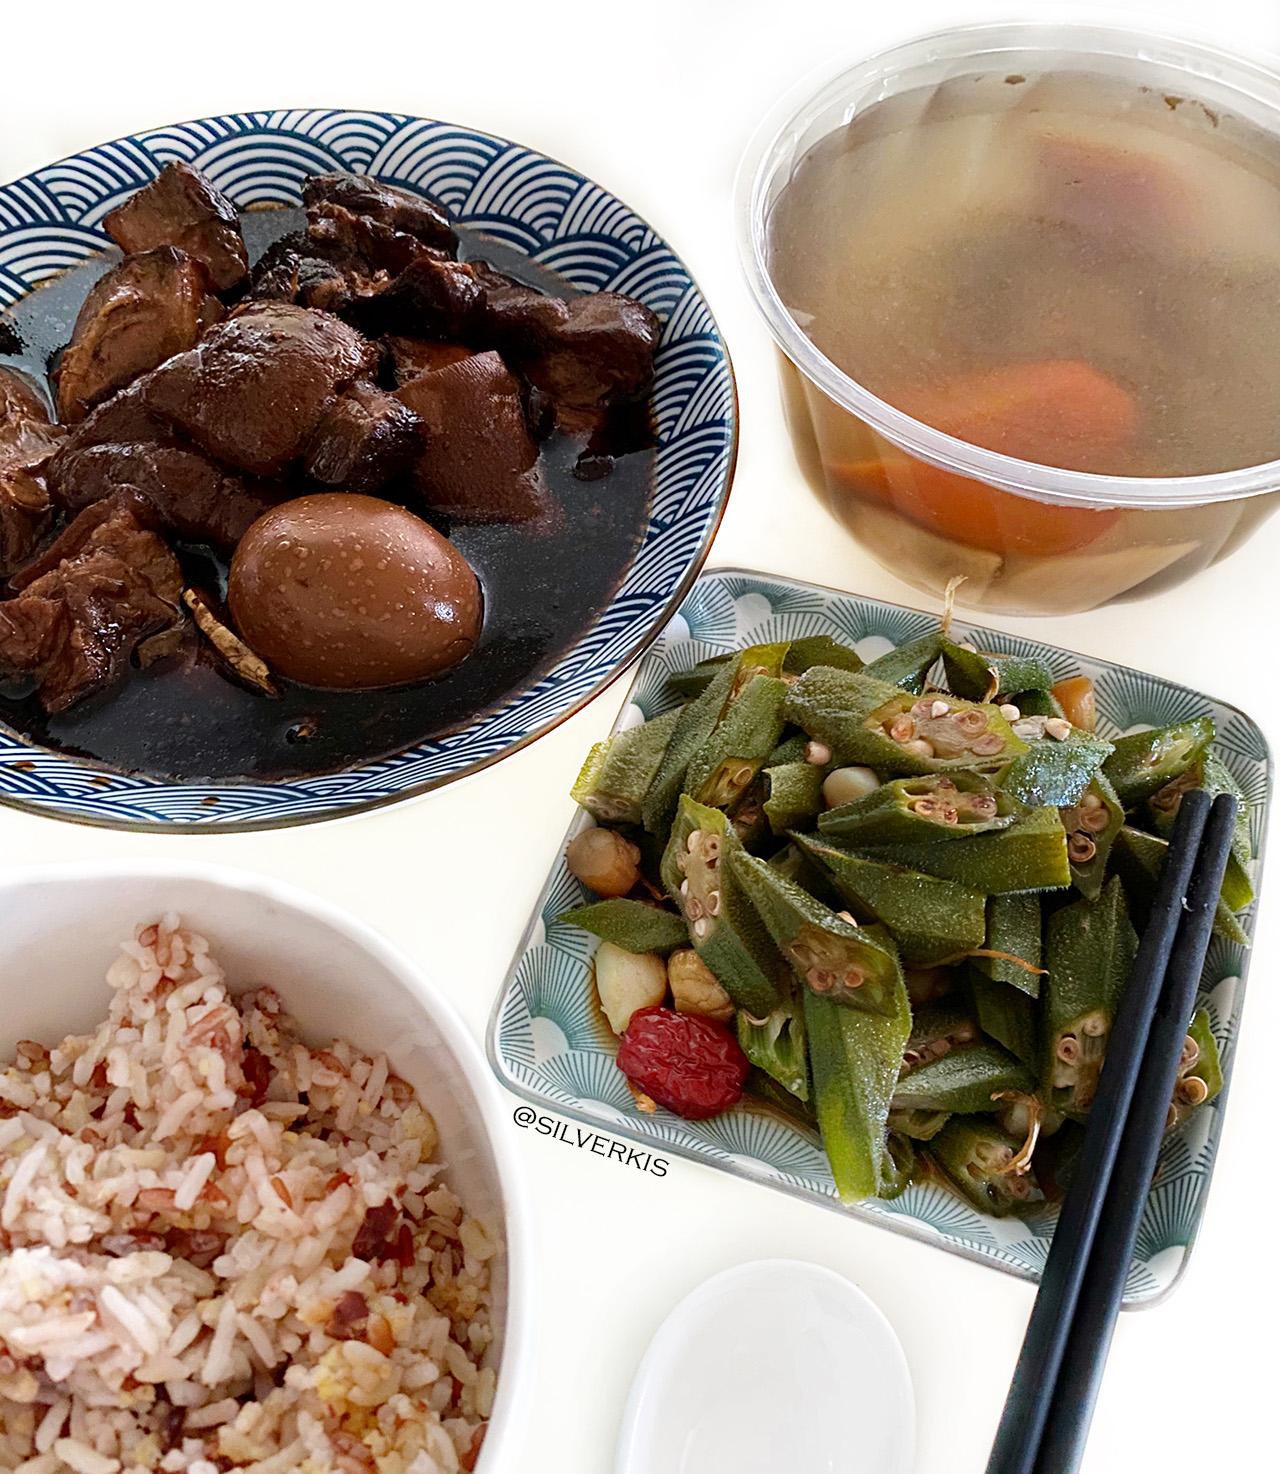 Tian Wei Signature Black Vinegar Pork Trotter